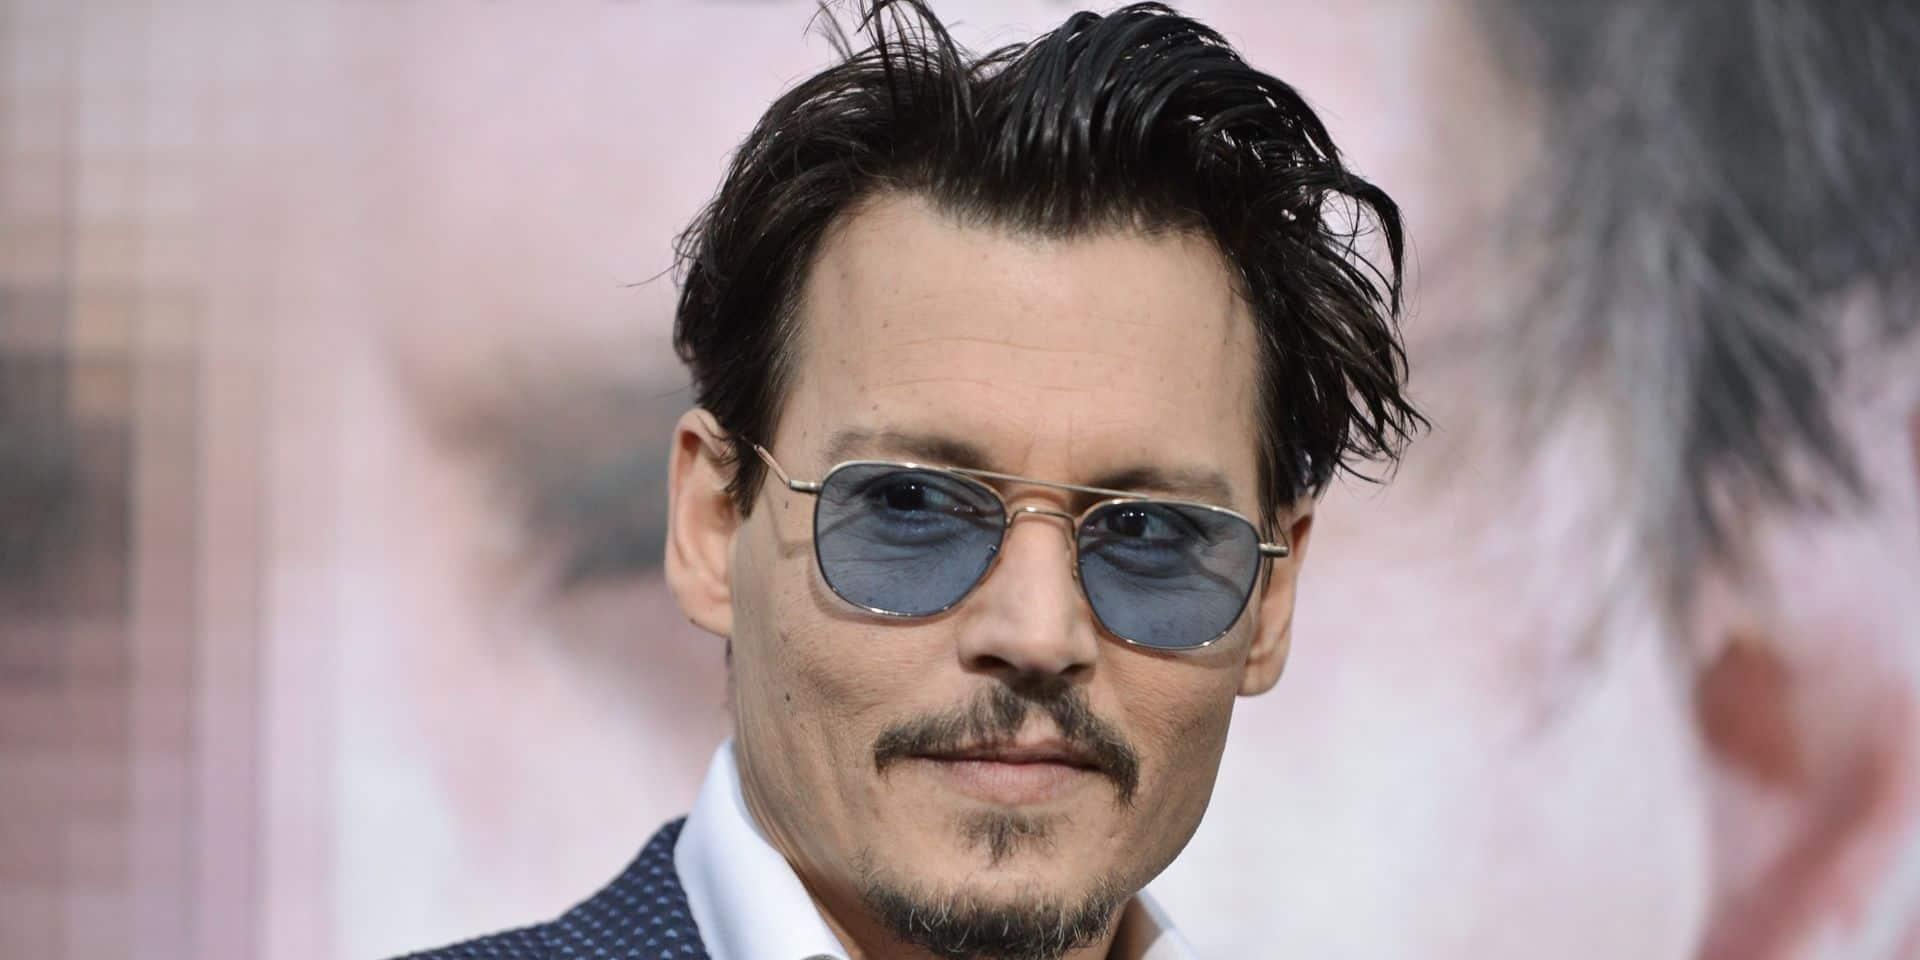 Johnny Depp rejoint Instagram en musique